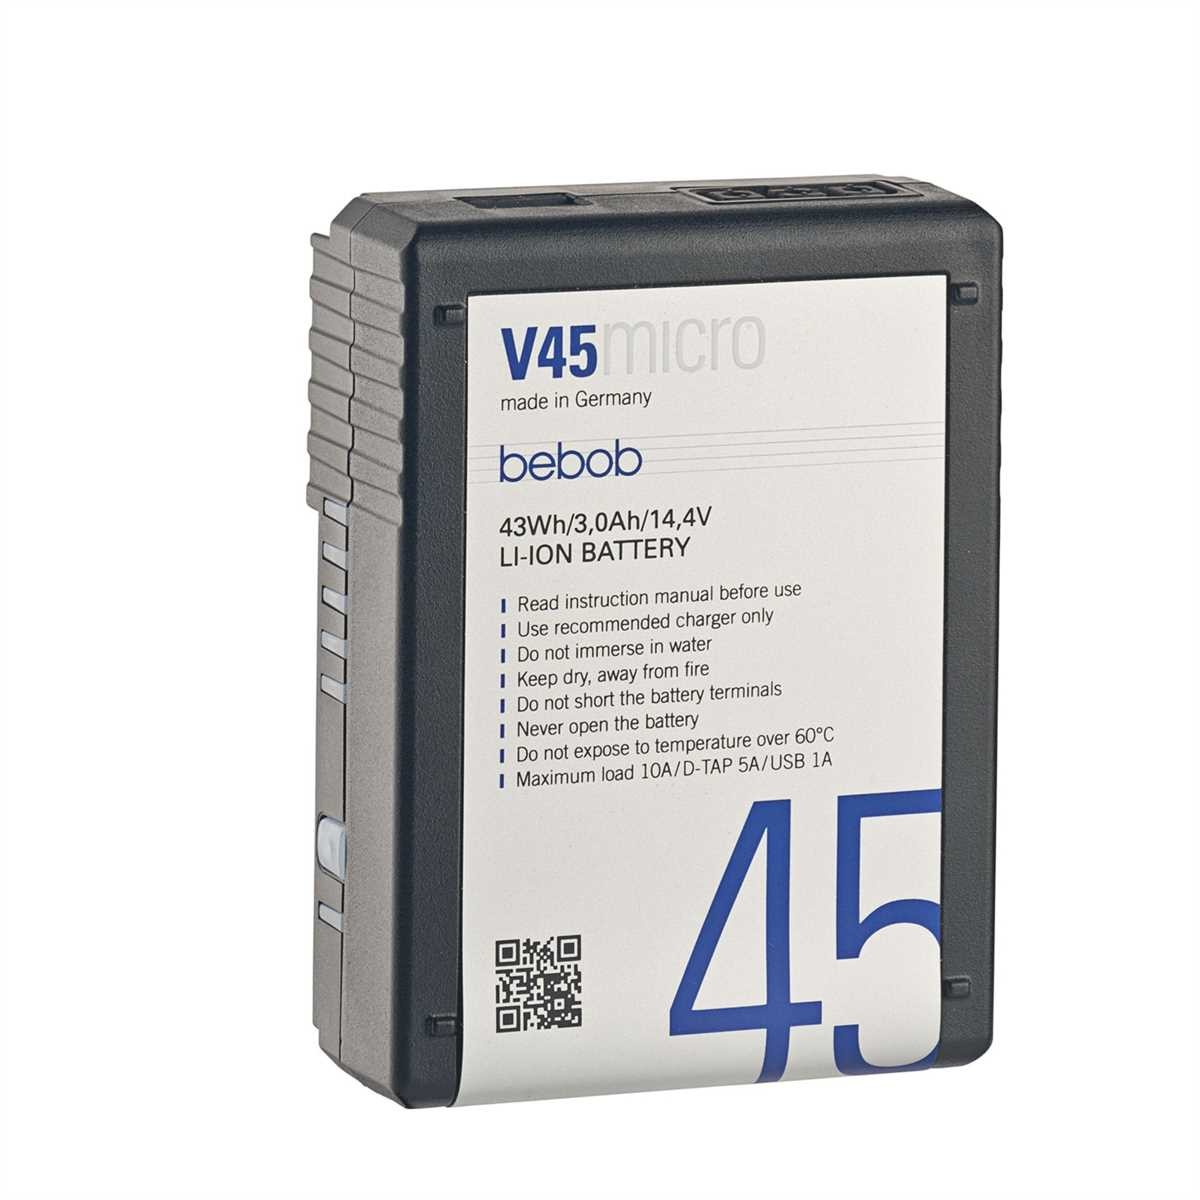 V45MICRO